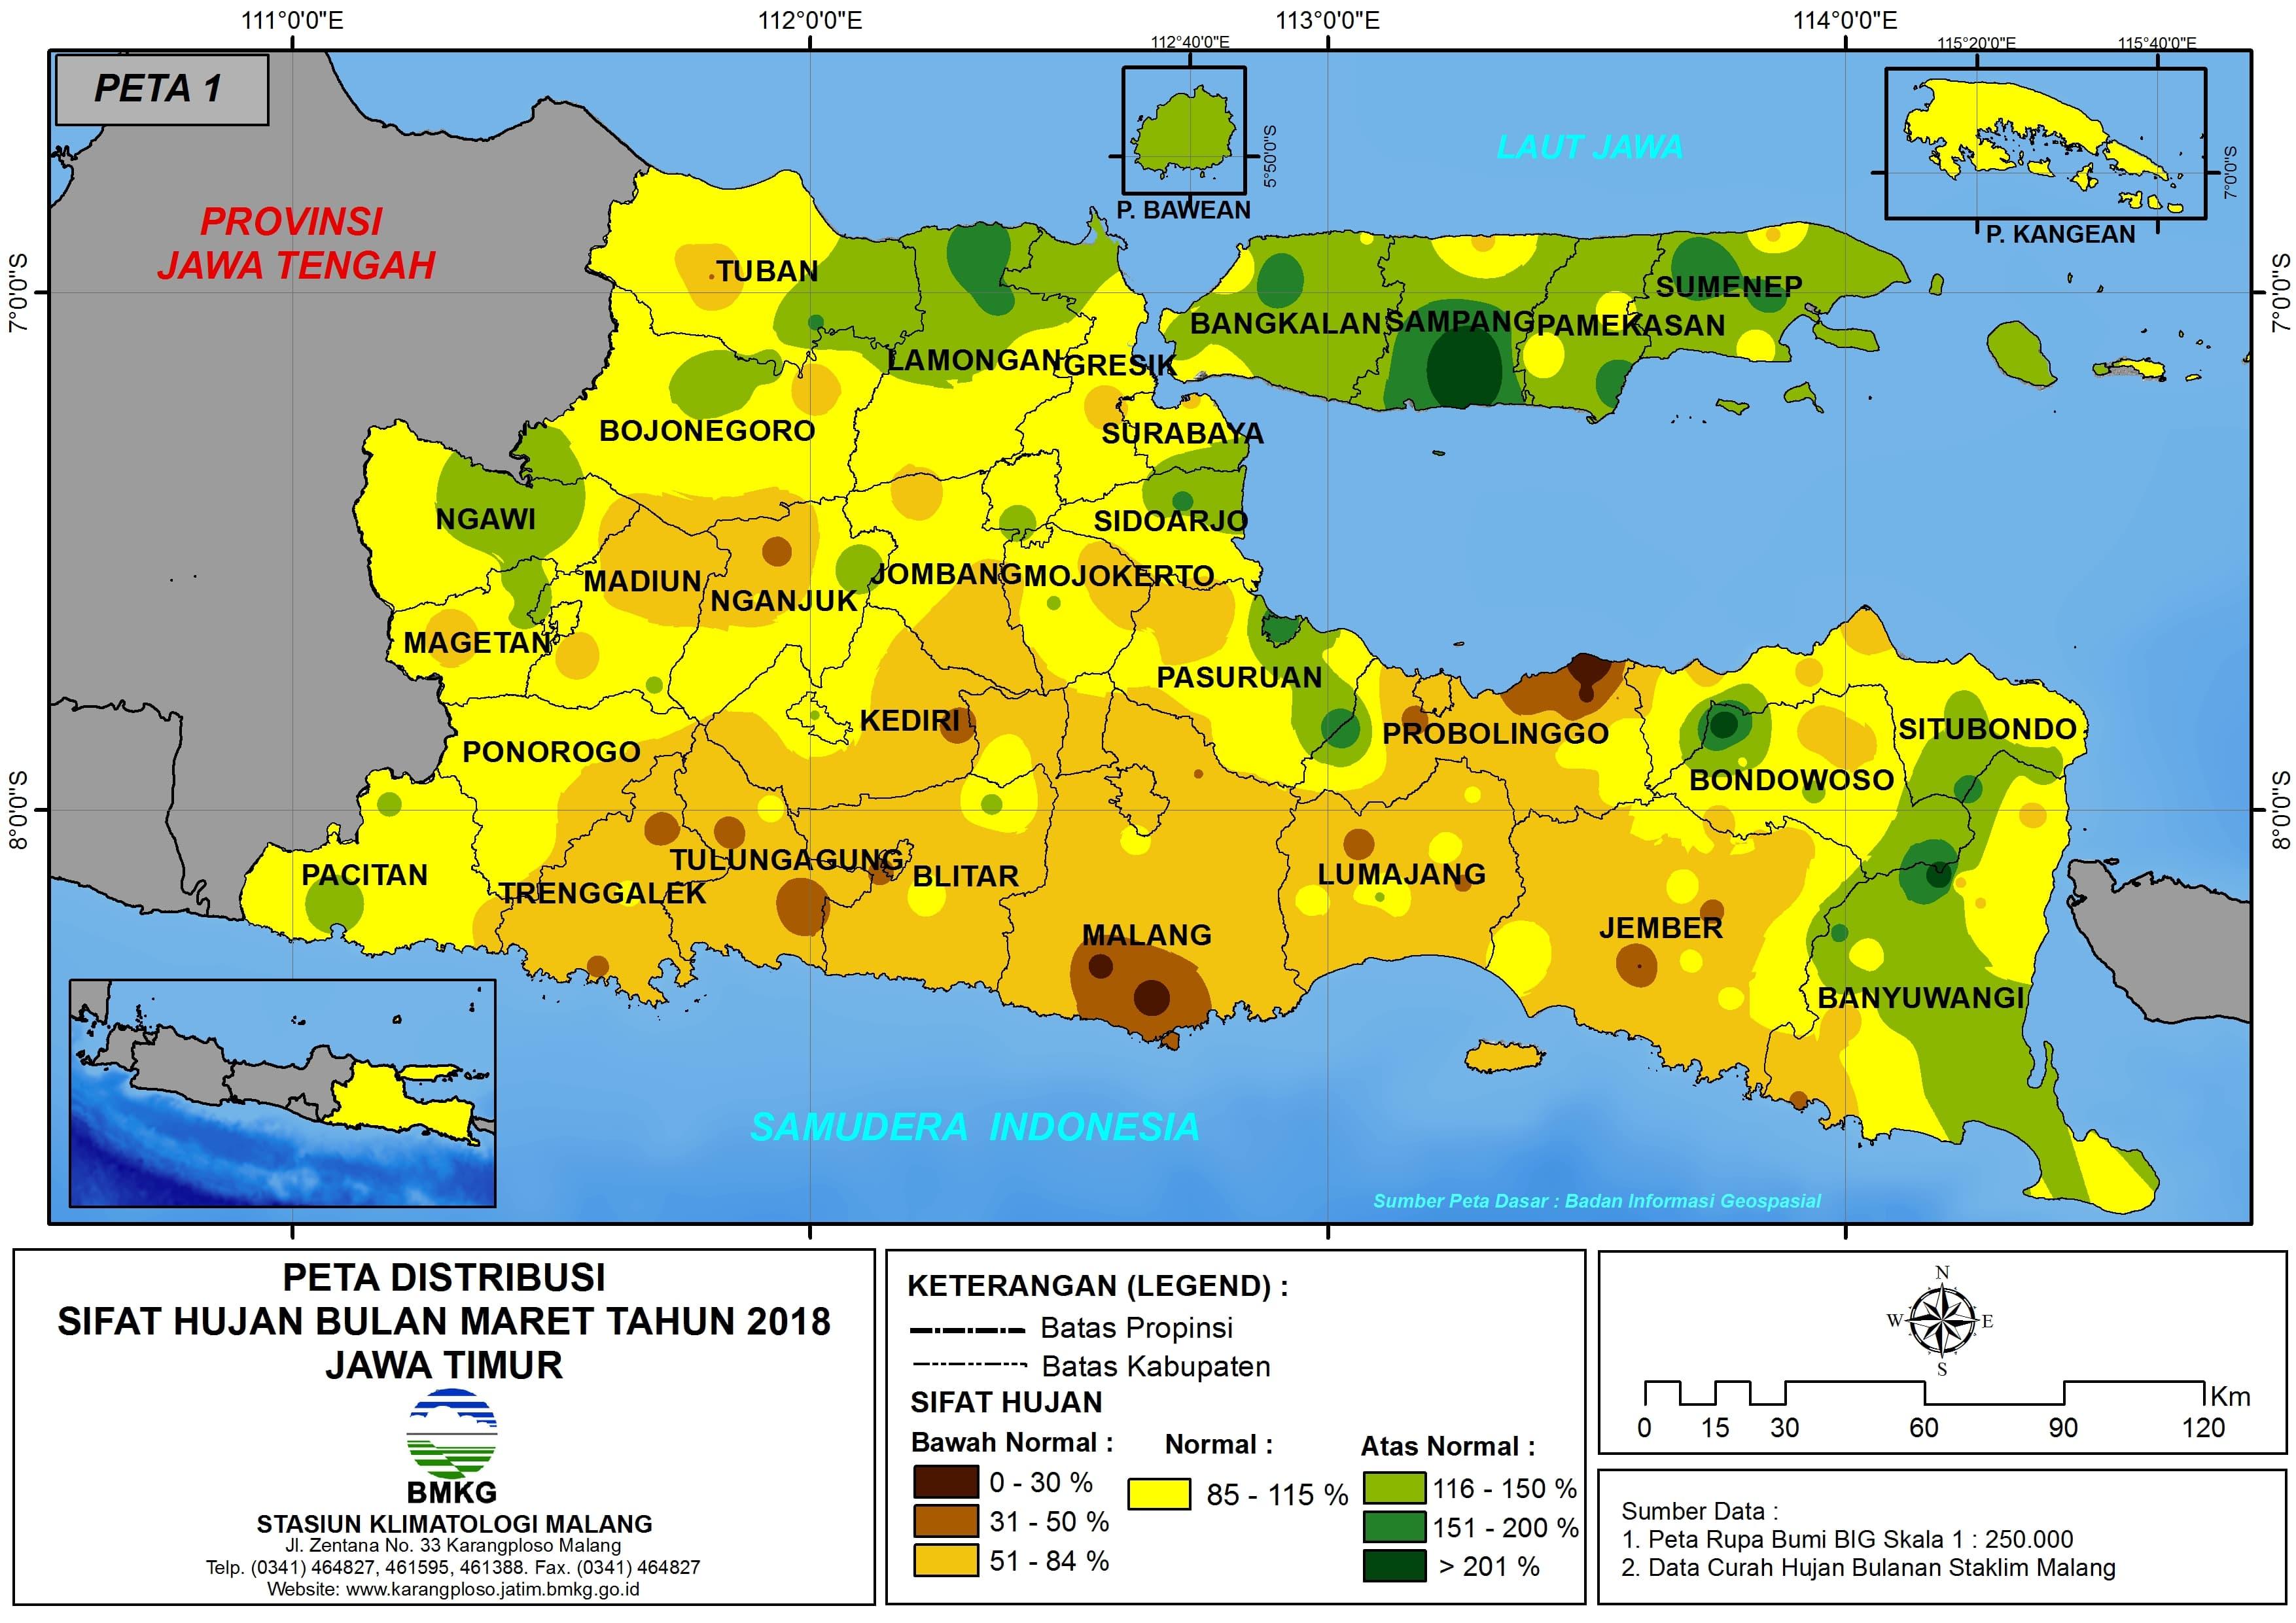 Analisis Distribusi Sifat Hujan Bulan Maret Tahun 2018 di Propinsi Jawa Timur